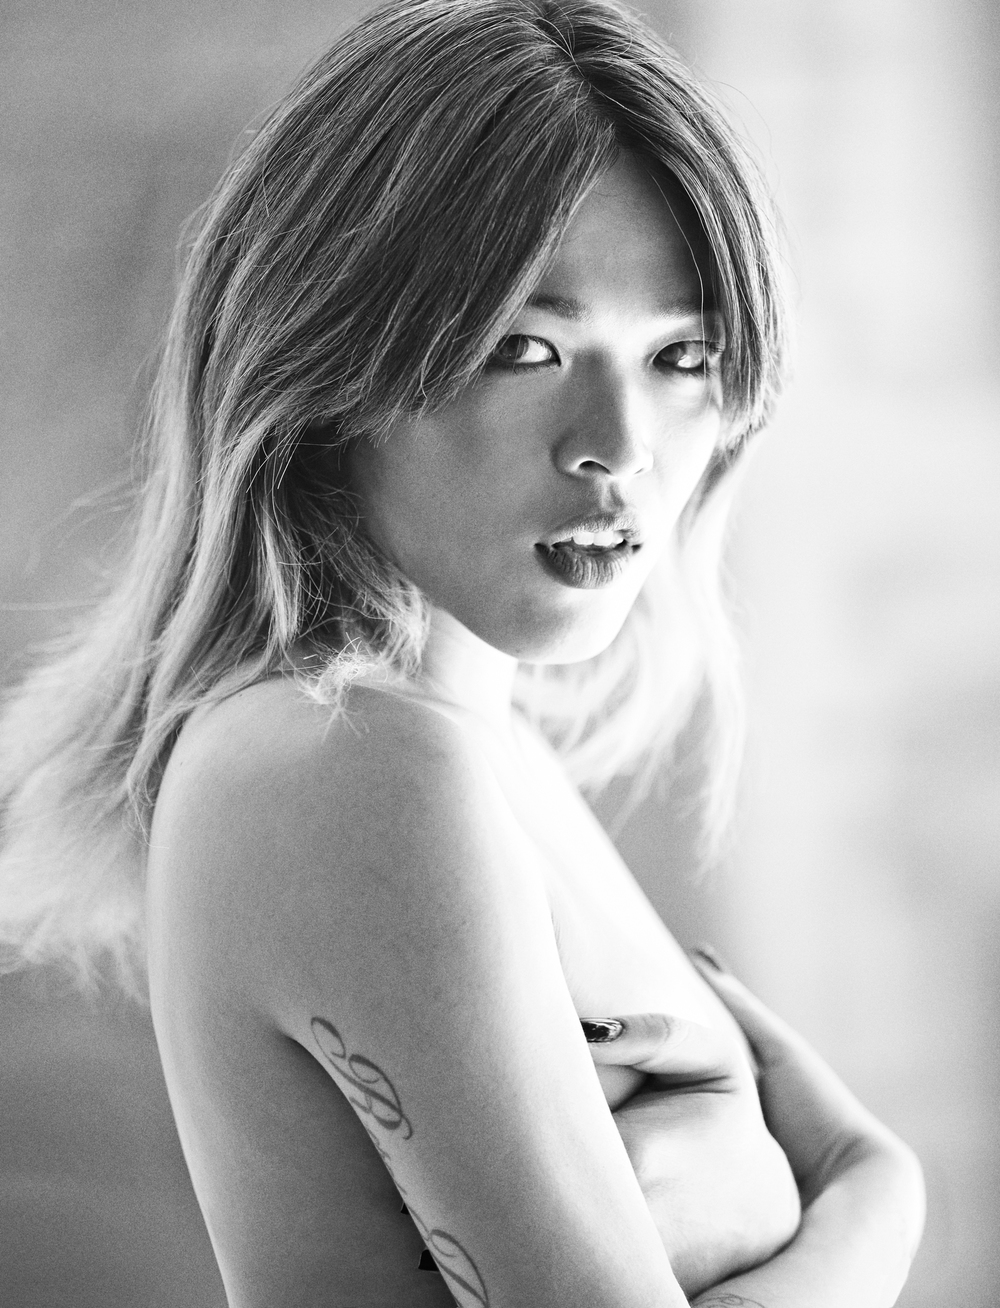 vikki+le+_+trans+models+new+york